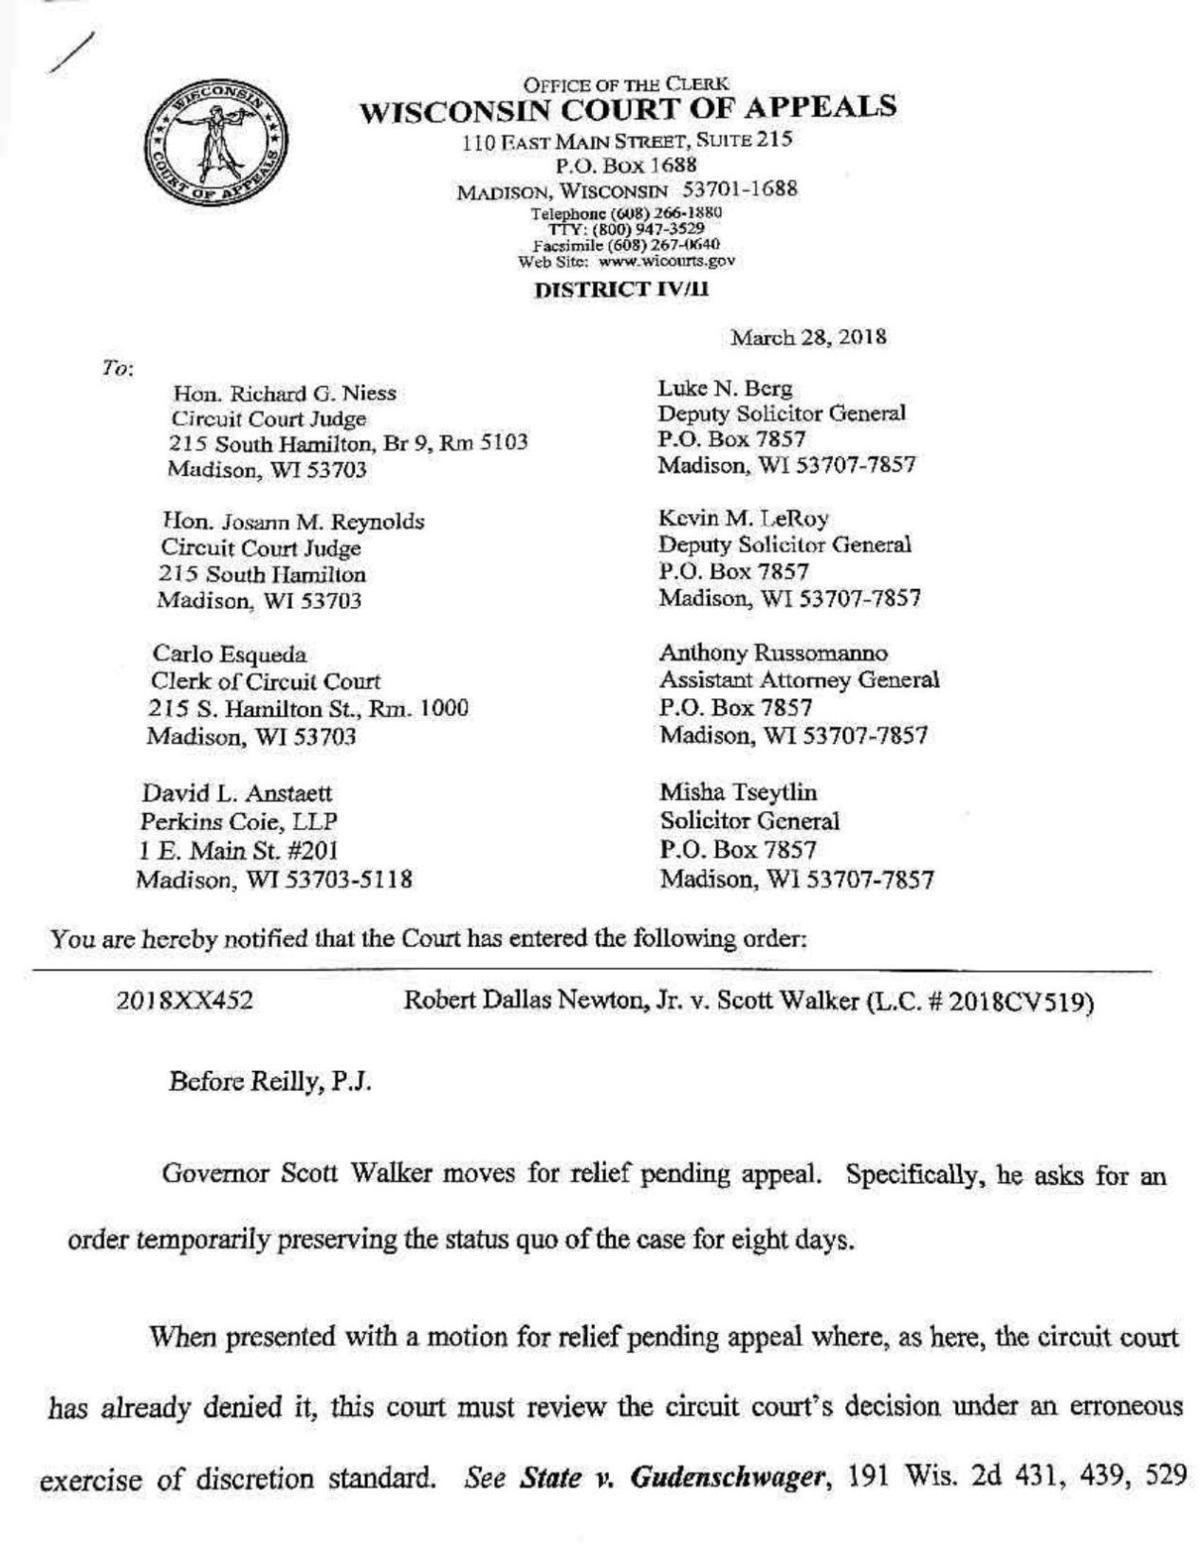 Appeals court denial